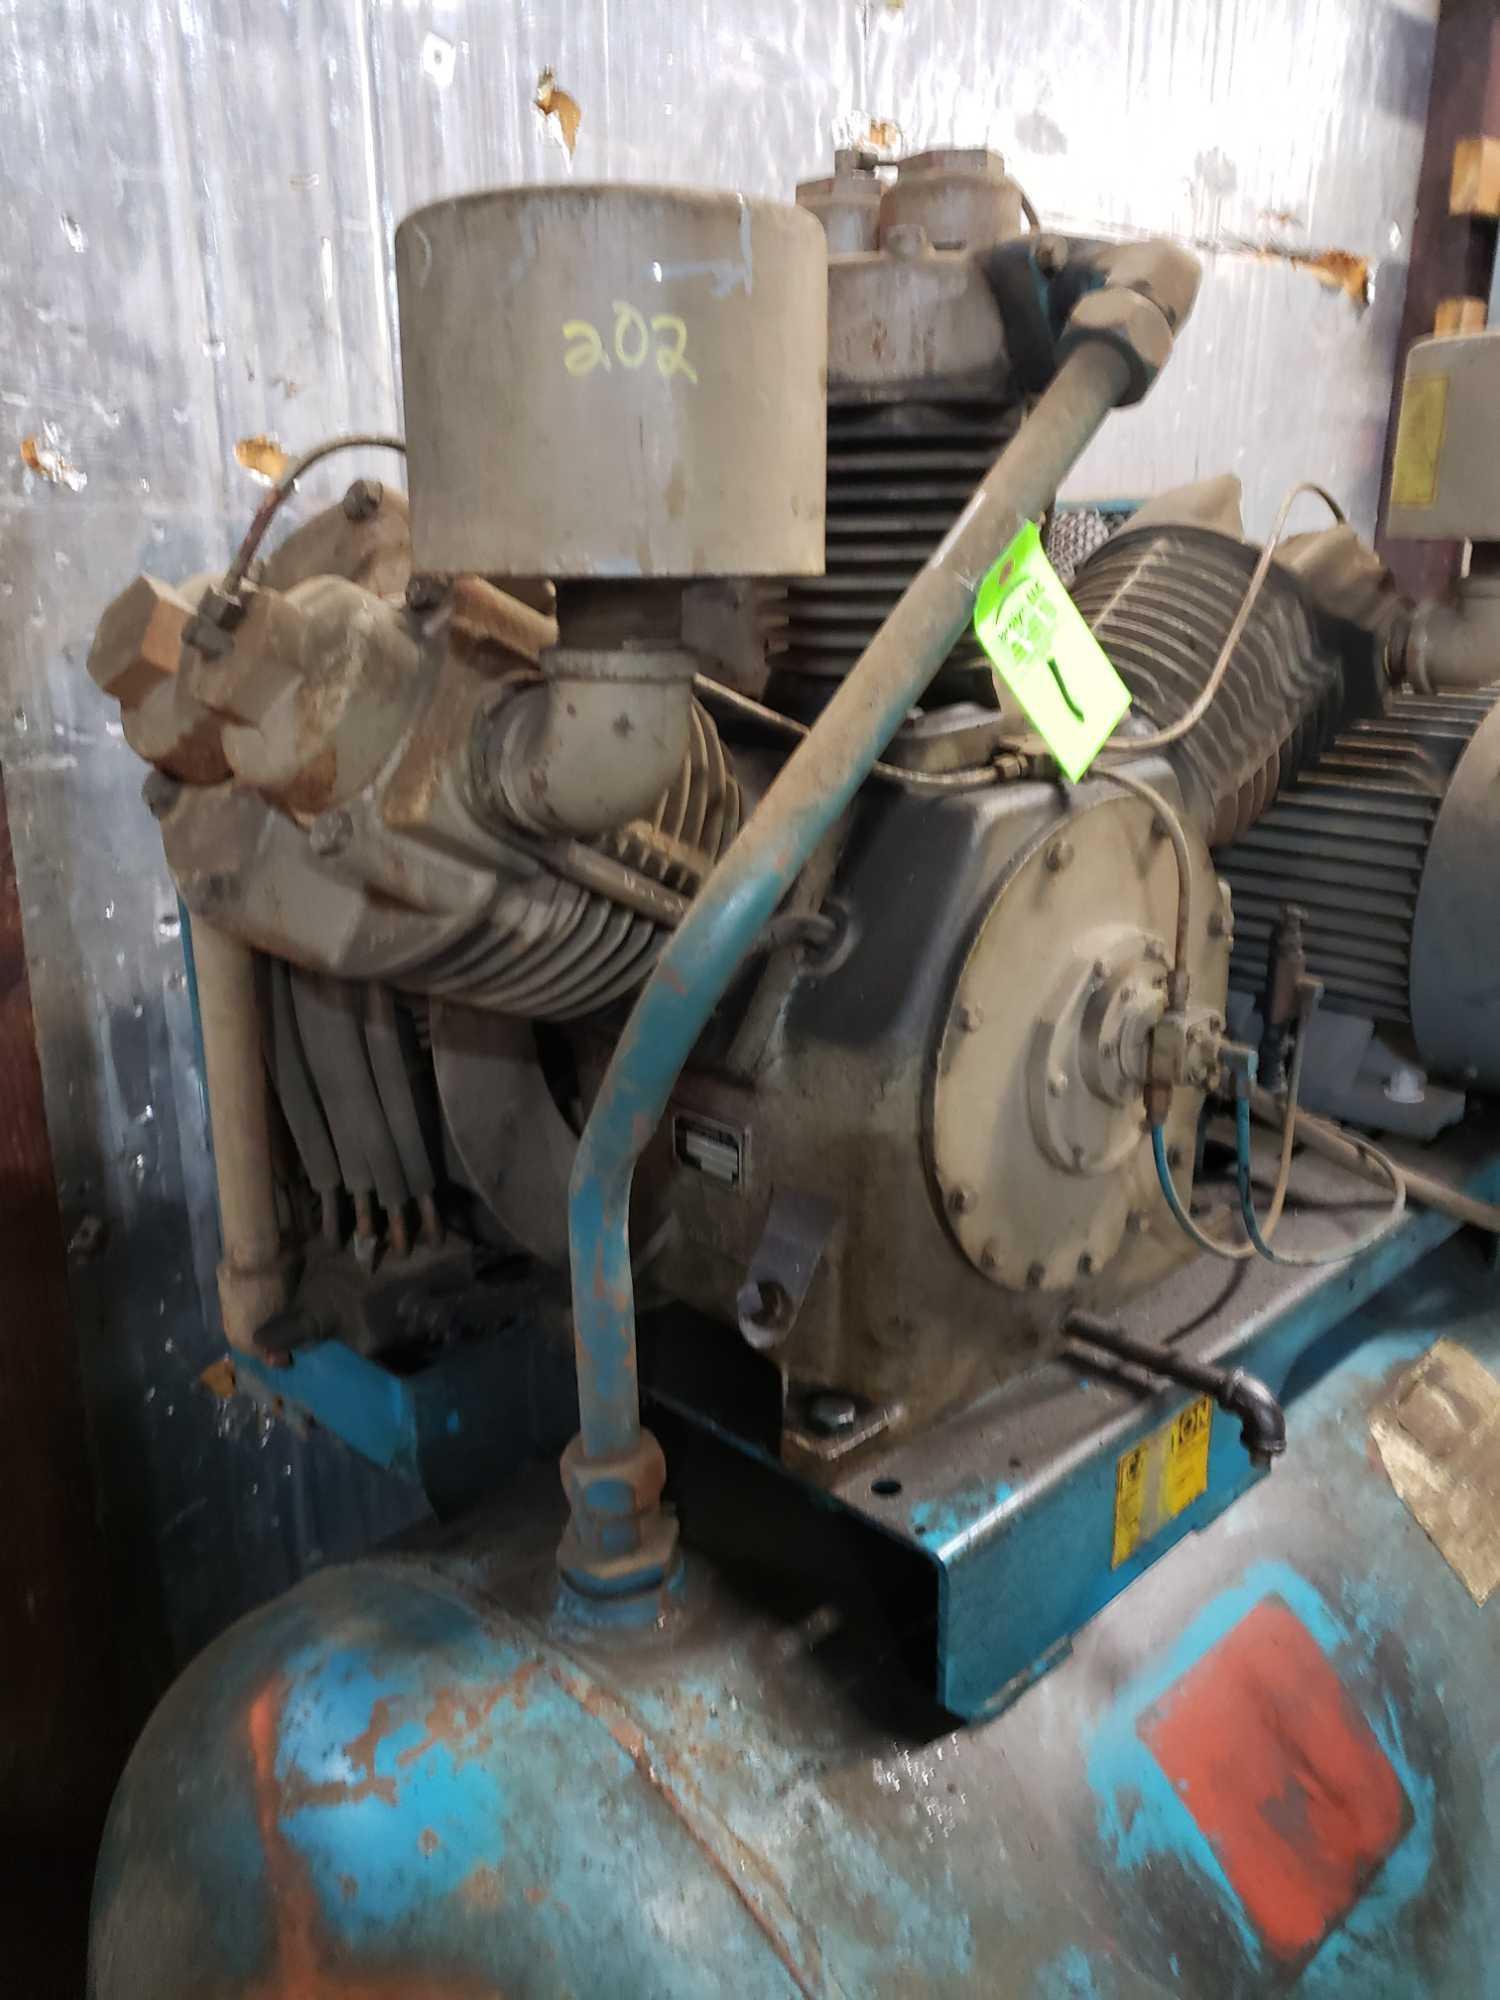 Lot 1 - LeRoi model 880a 25hp compressor. 3 phase, 230/460v.